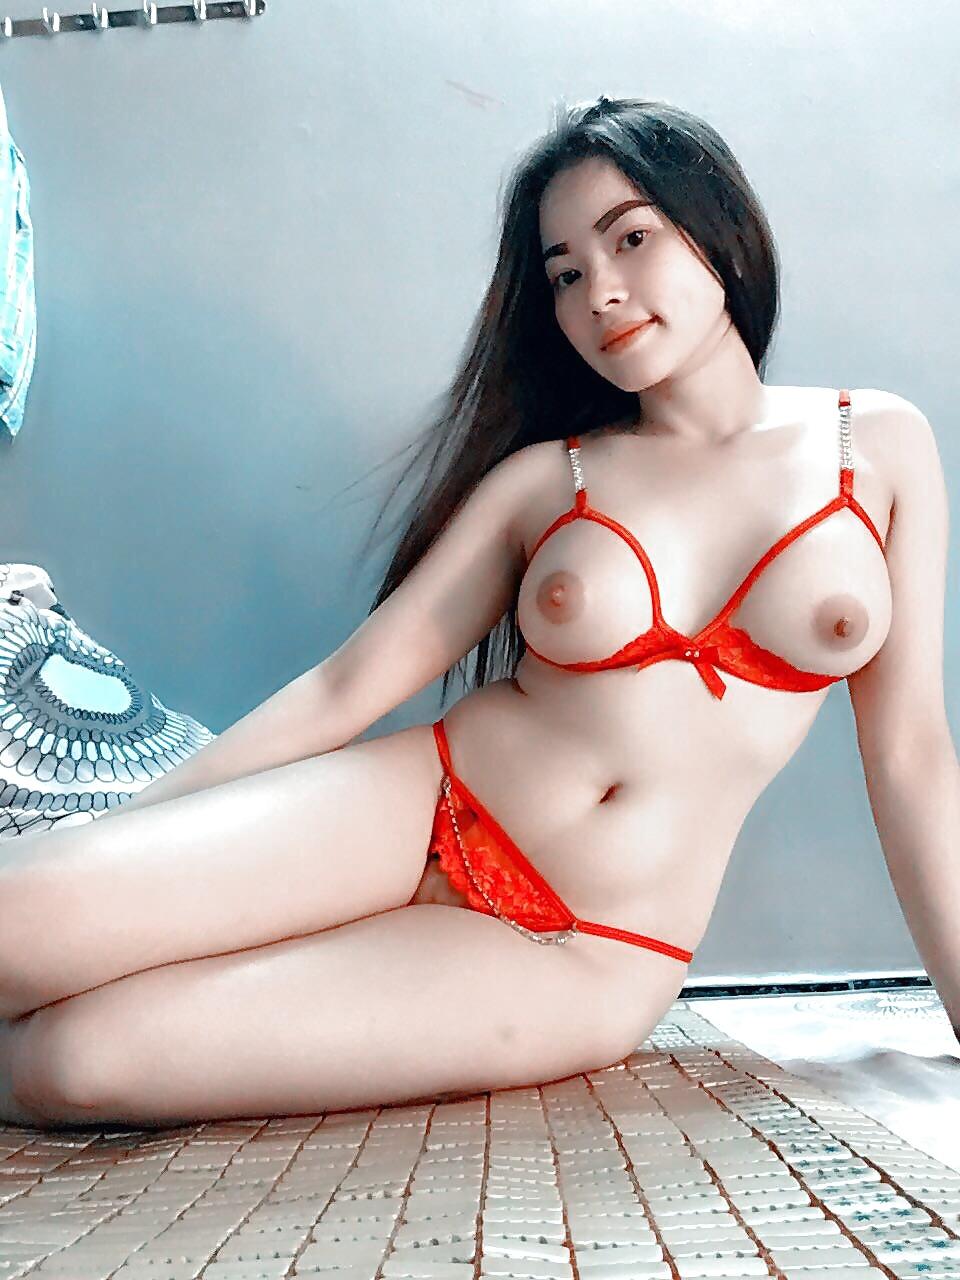 Фото Проституток Вьетнама